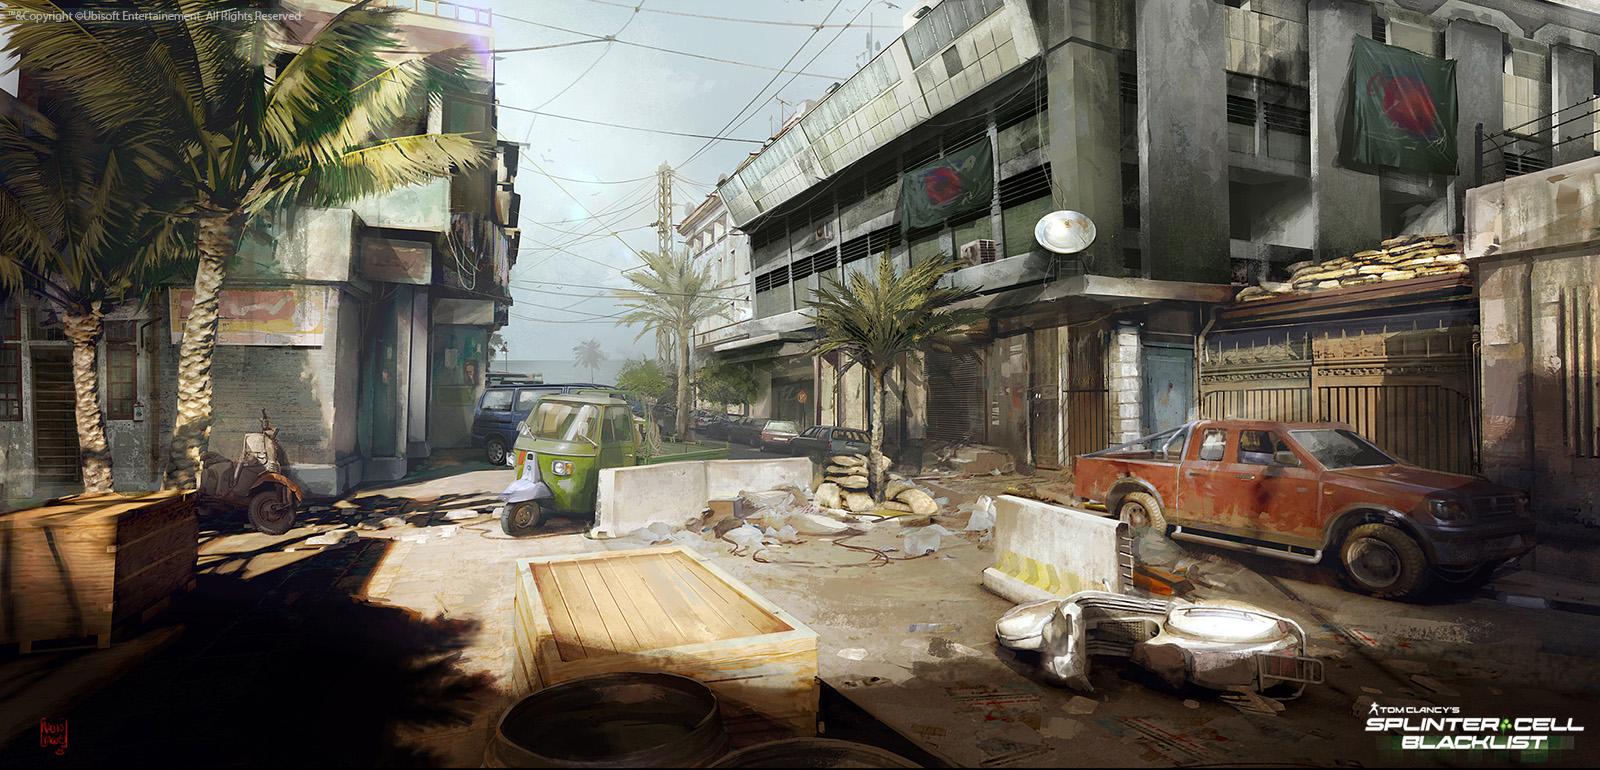 Splinter Cell Blacklist Concept Art By Nacho Yag 252 E